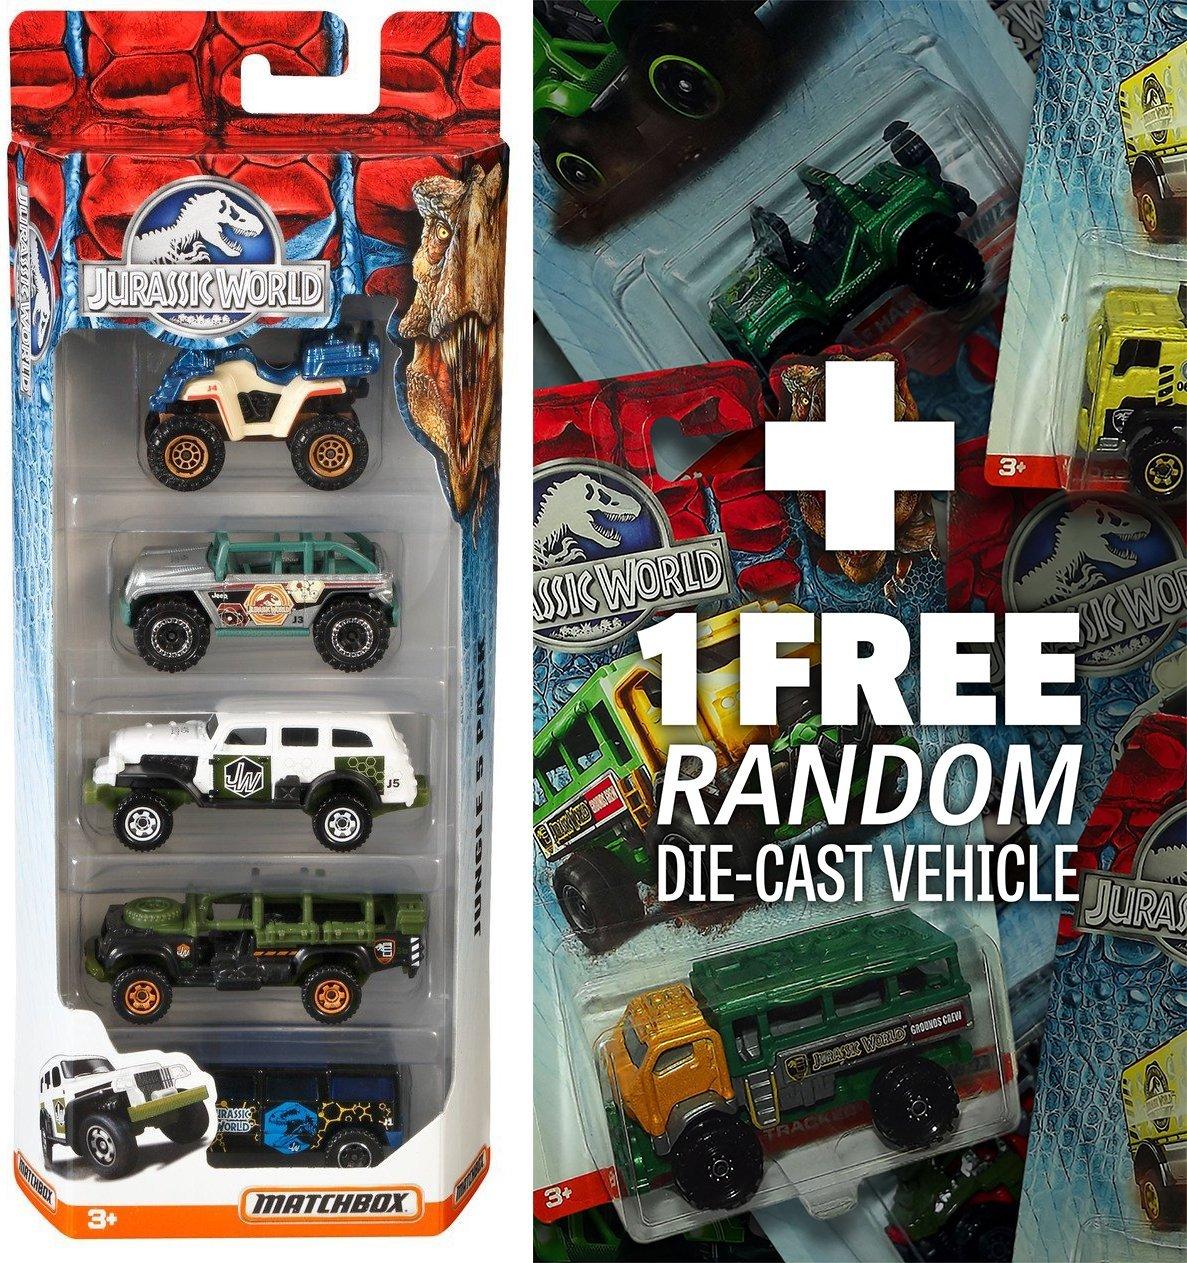 Jurassic World Land 5-Vehicle Pack (NOT RANDOMLY PICKED) + 1 FREE Official Jurassic World Matchbox Die-cast Vehicle Bundle [Set# CJM06]